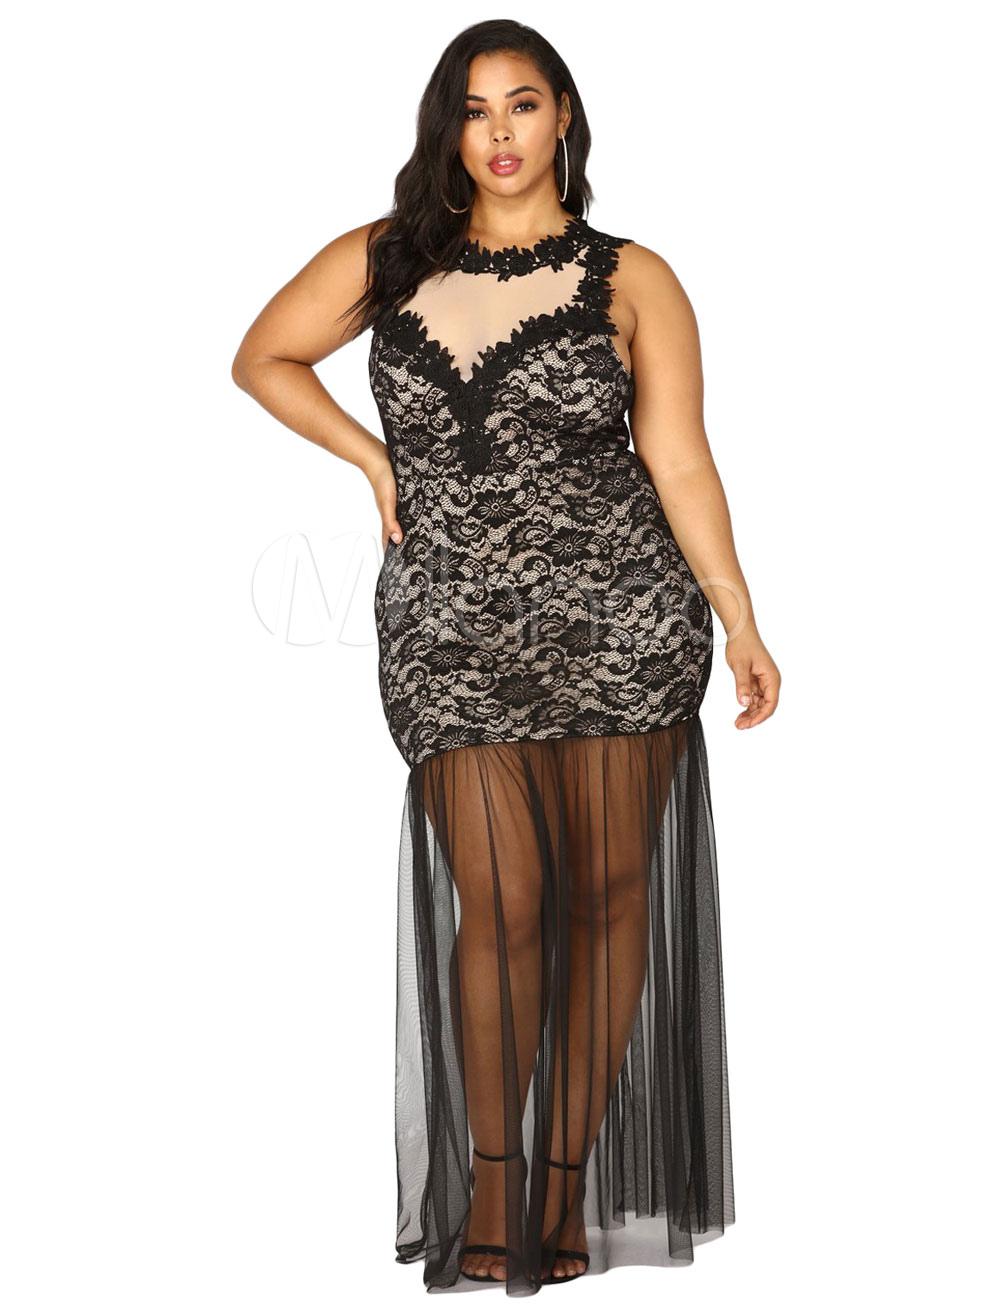 Plus Size Club Dress Black Maxi Dress Lace Semi Sheer Shaping Clubwear